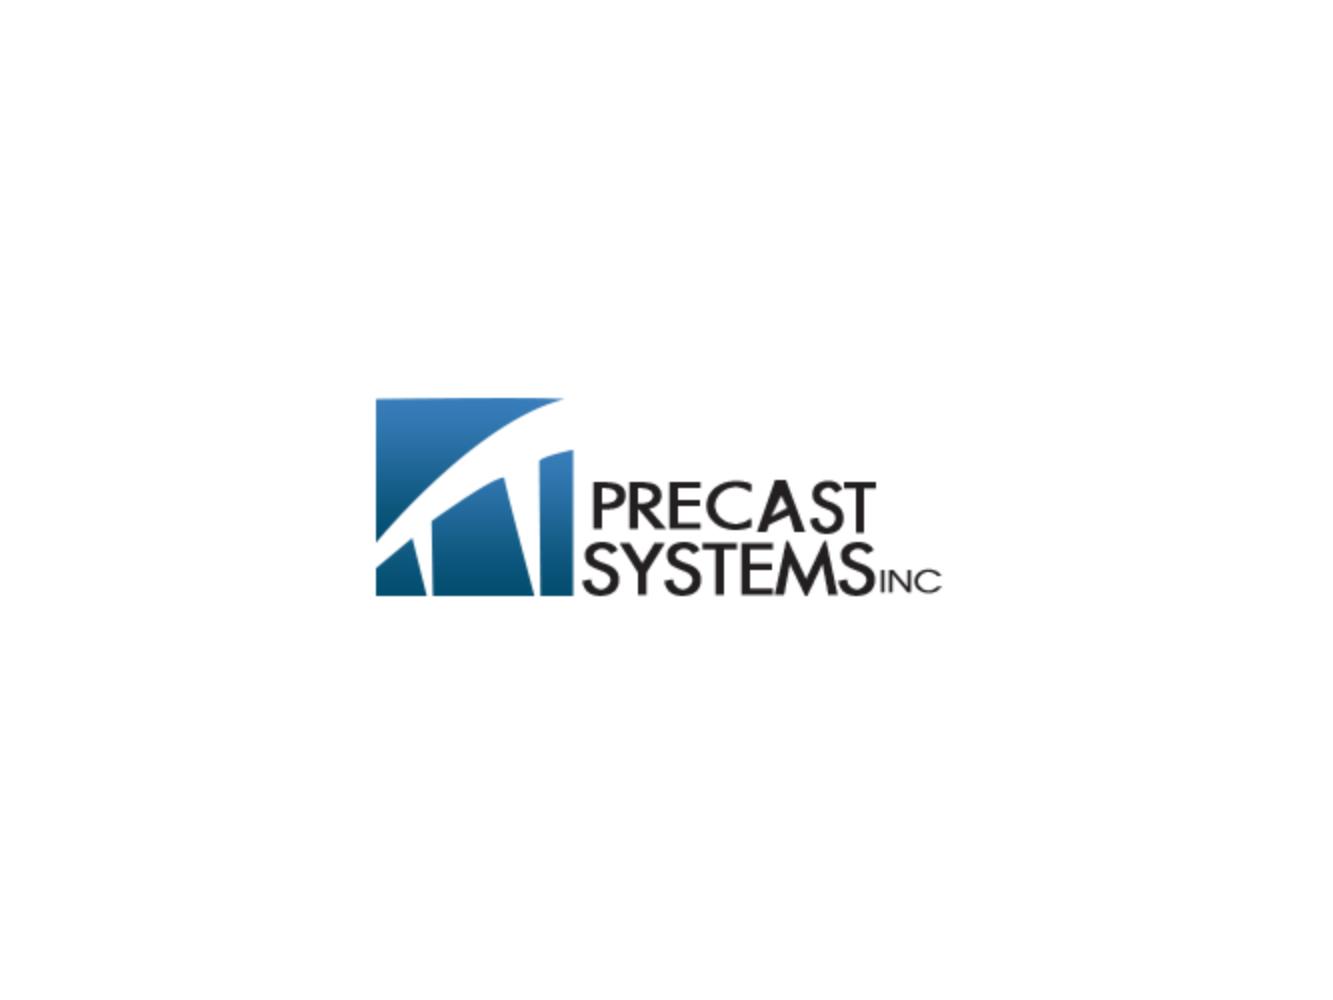 Precast Systems Inc.